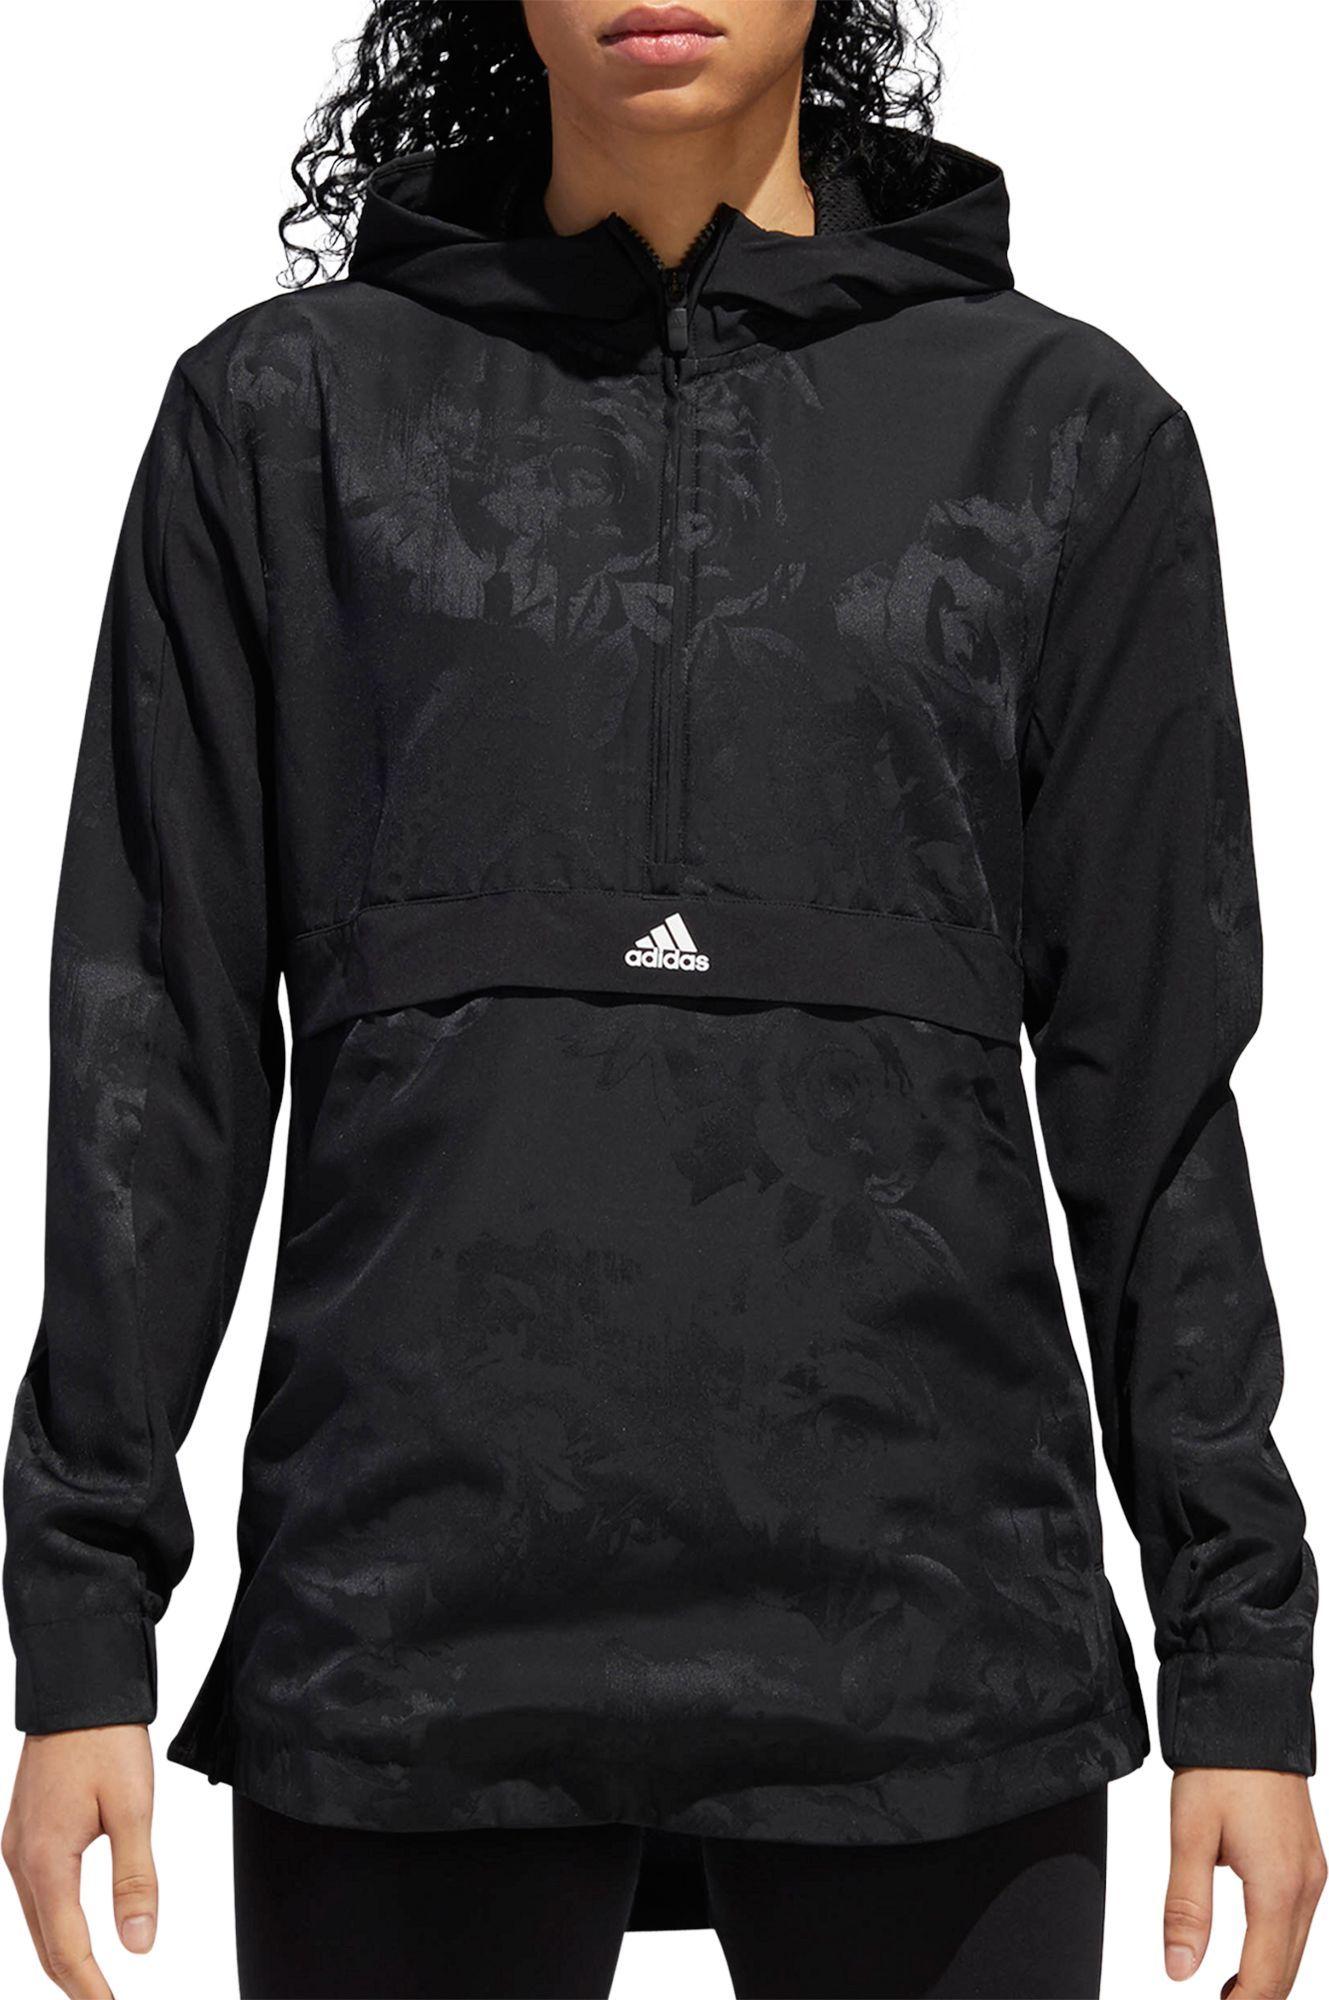 adidas adidas Men's Essentials Logo Hoodie, Size: Medium, Black from DICKS Sporting Goods | Shop